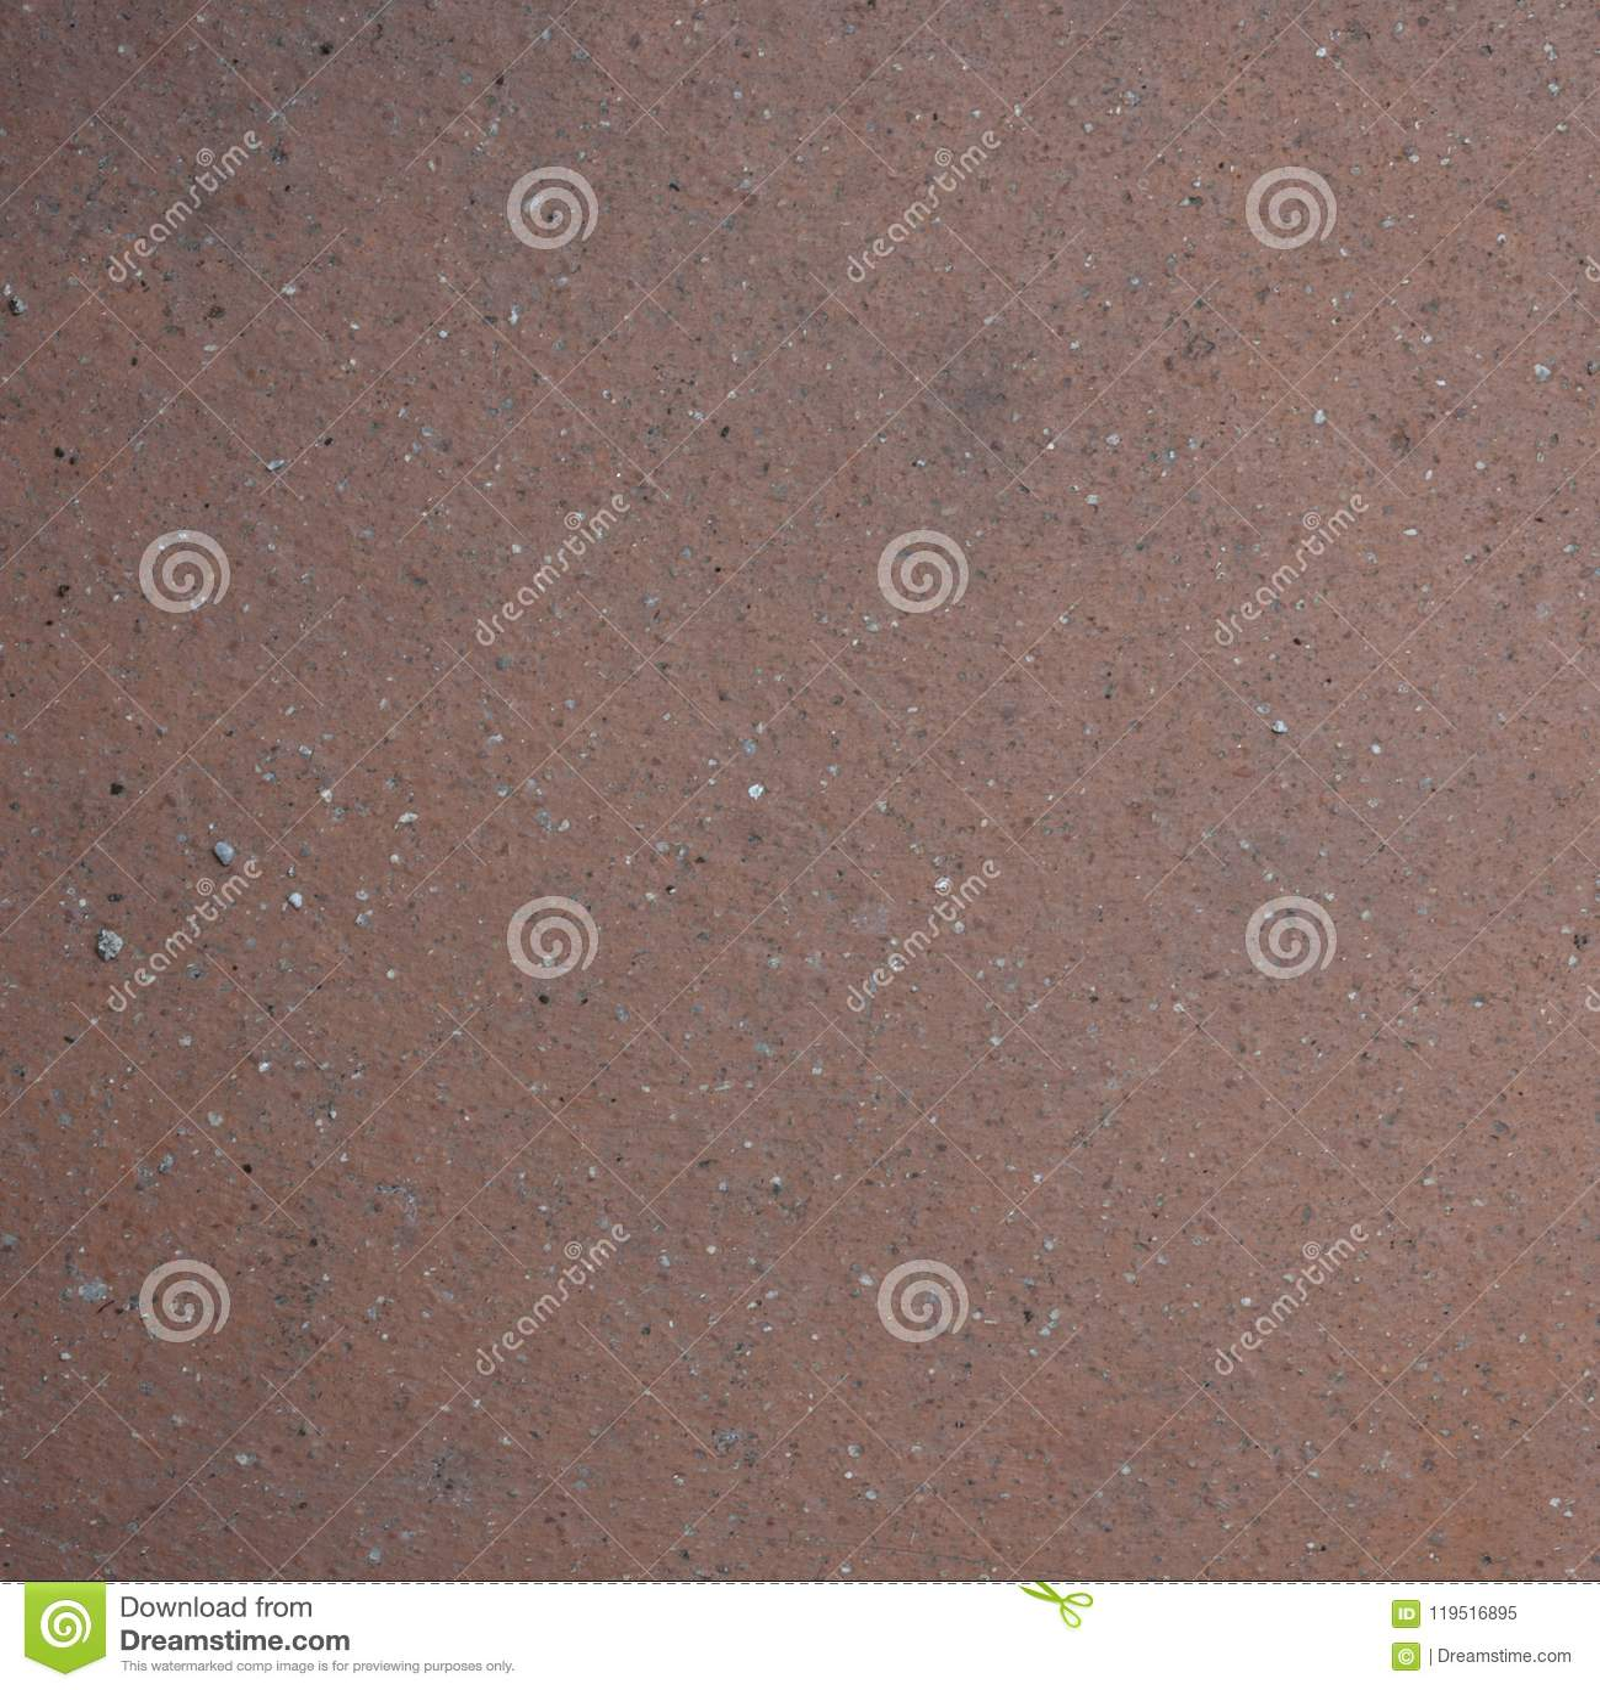 Tileable Seamless Texture Italian Terracotta Tile Stock Image